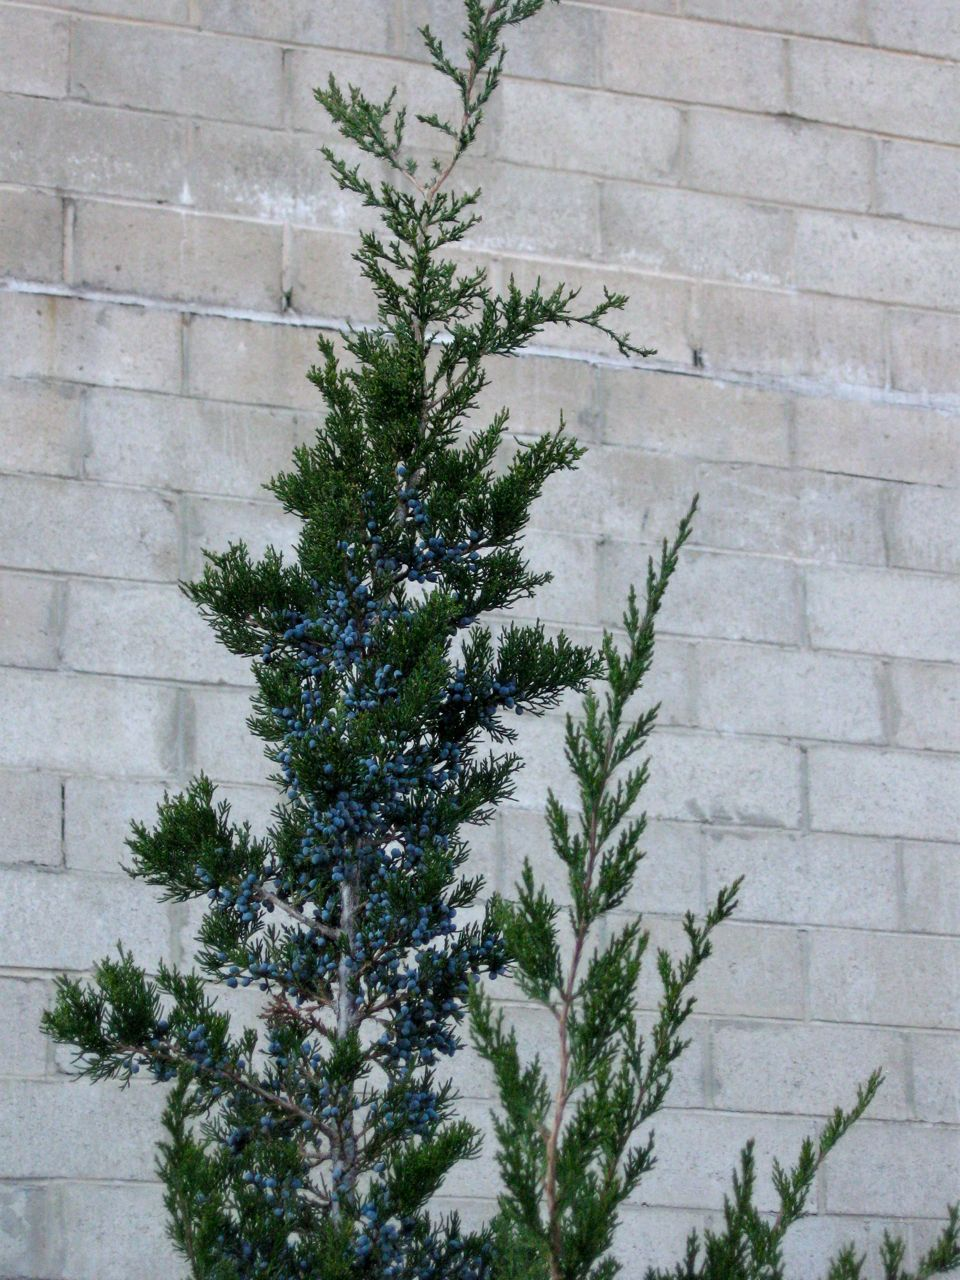 When Should I Prune Juniper Trees